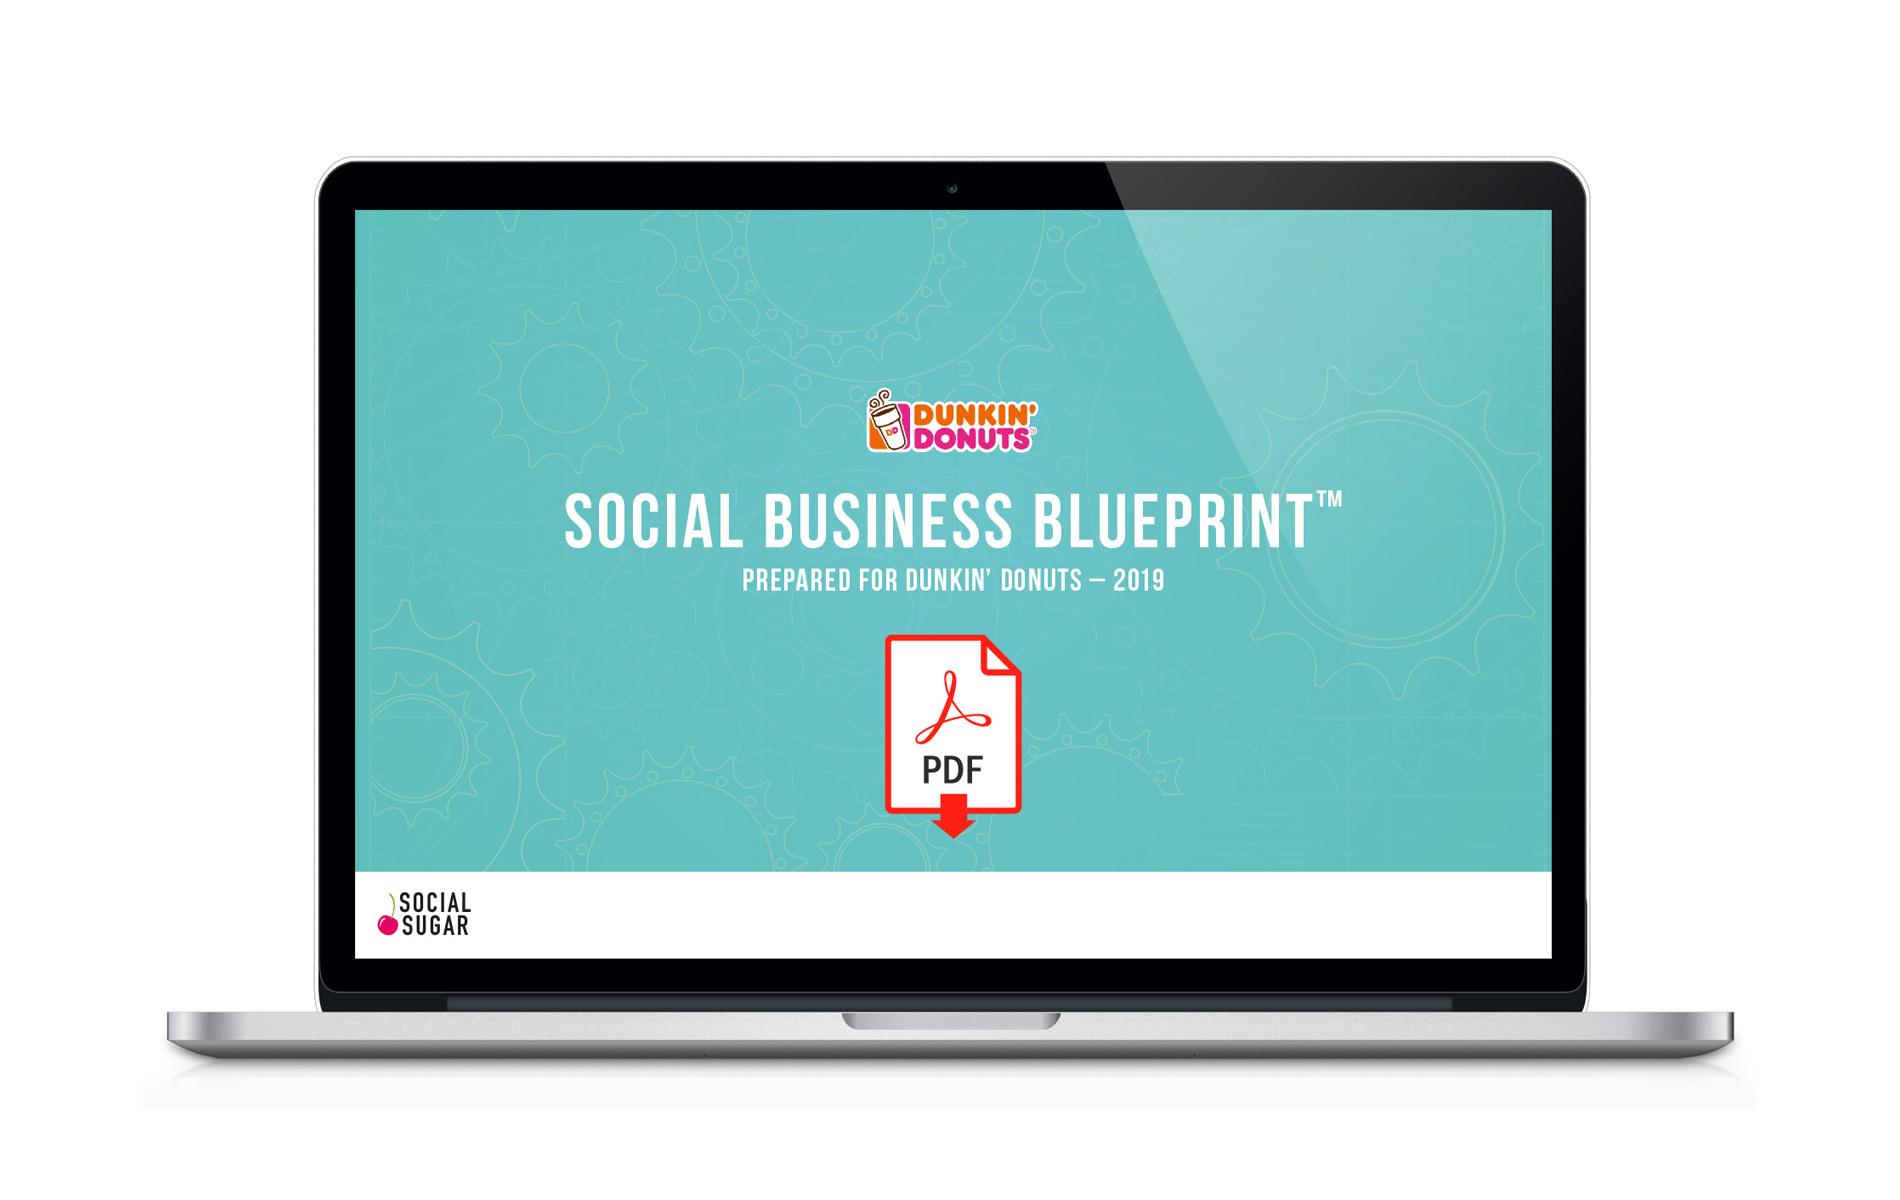 Macbook-Pro_Social-Blueprint-85-2.jpg